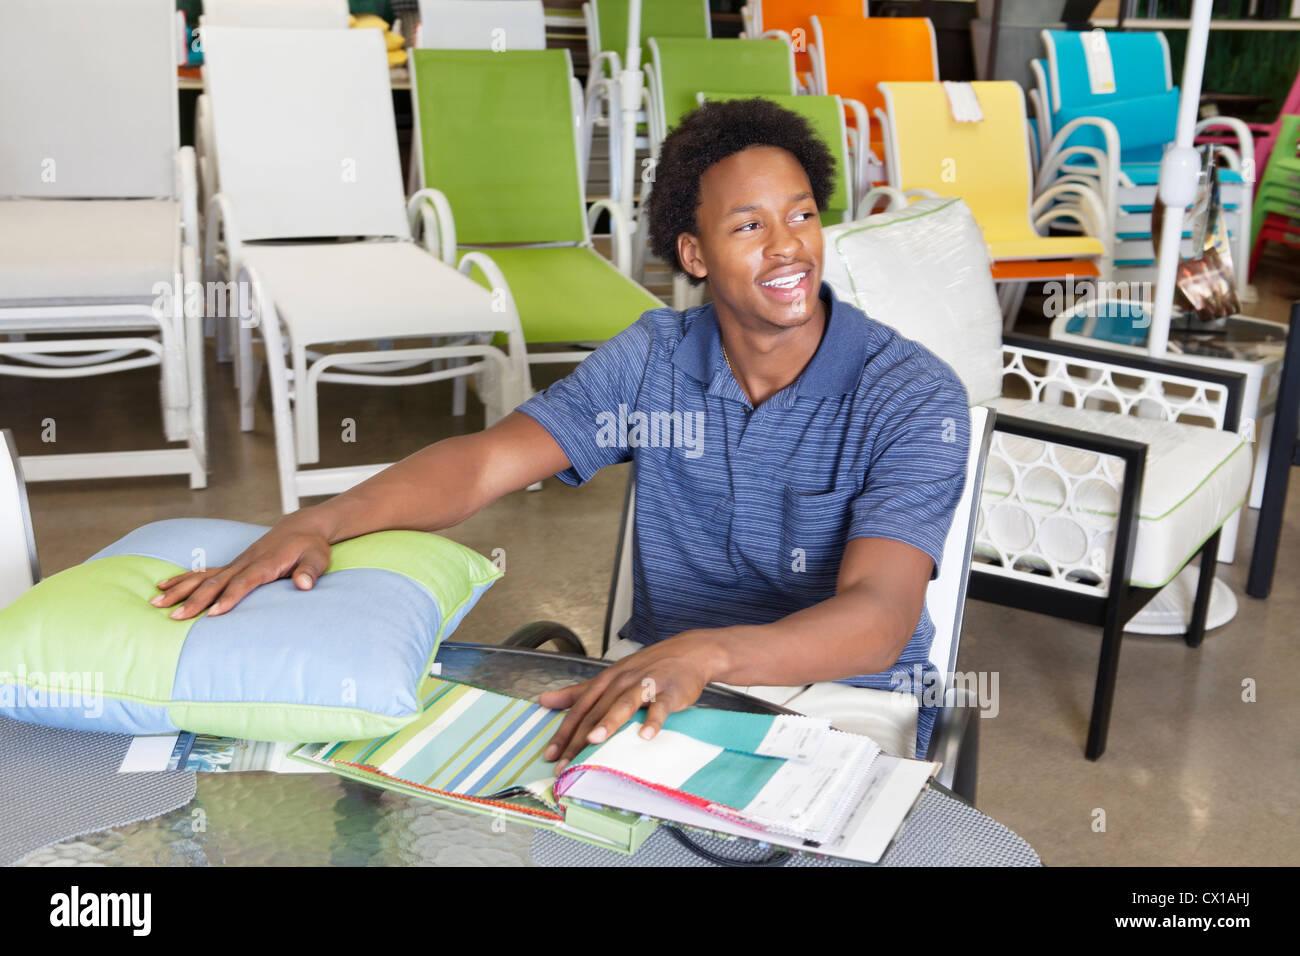 Male African American Salesperson Working In Garden Furniture Store